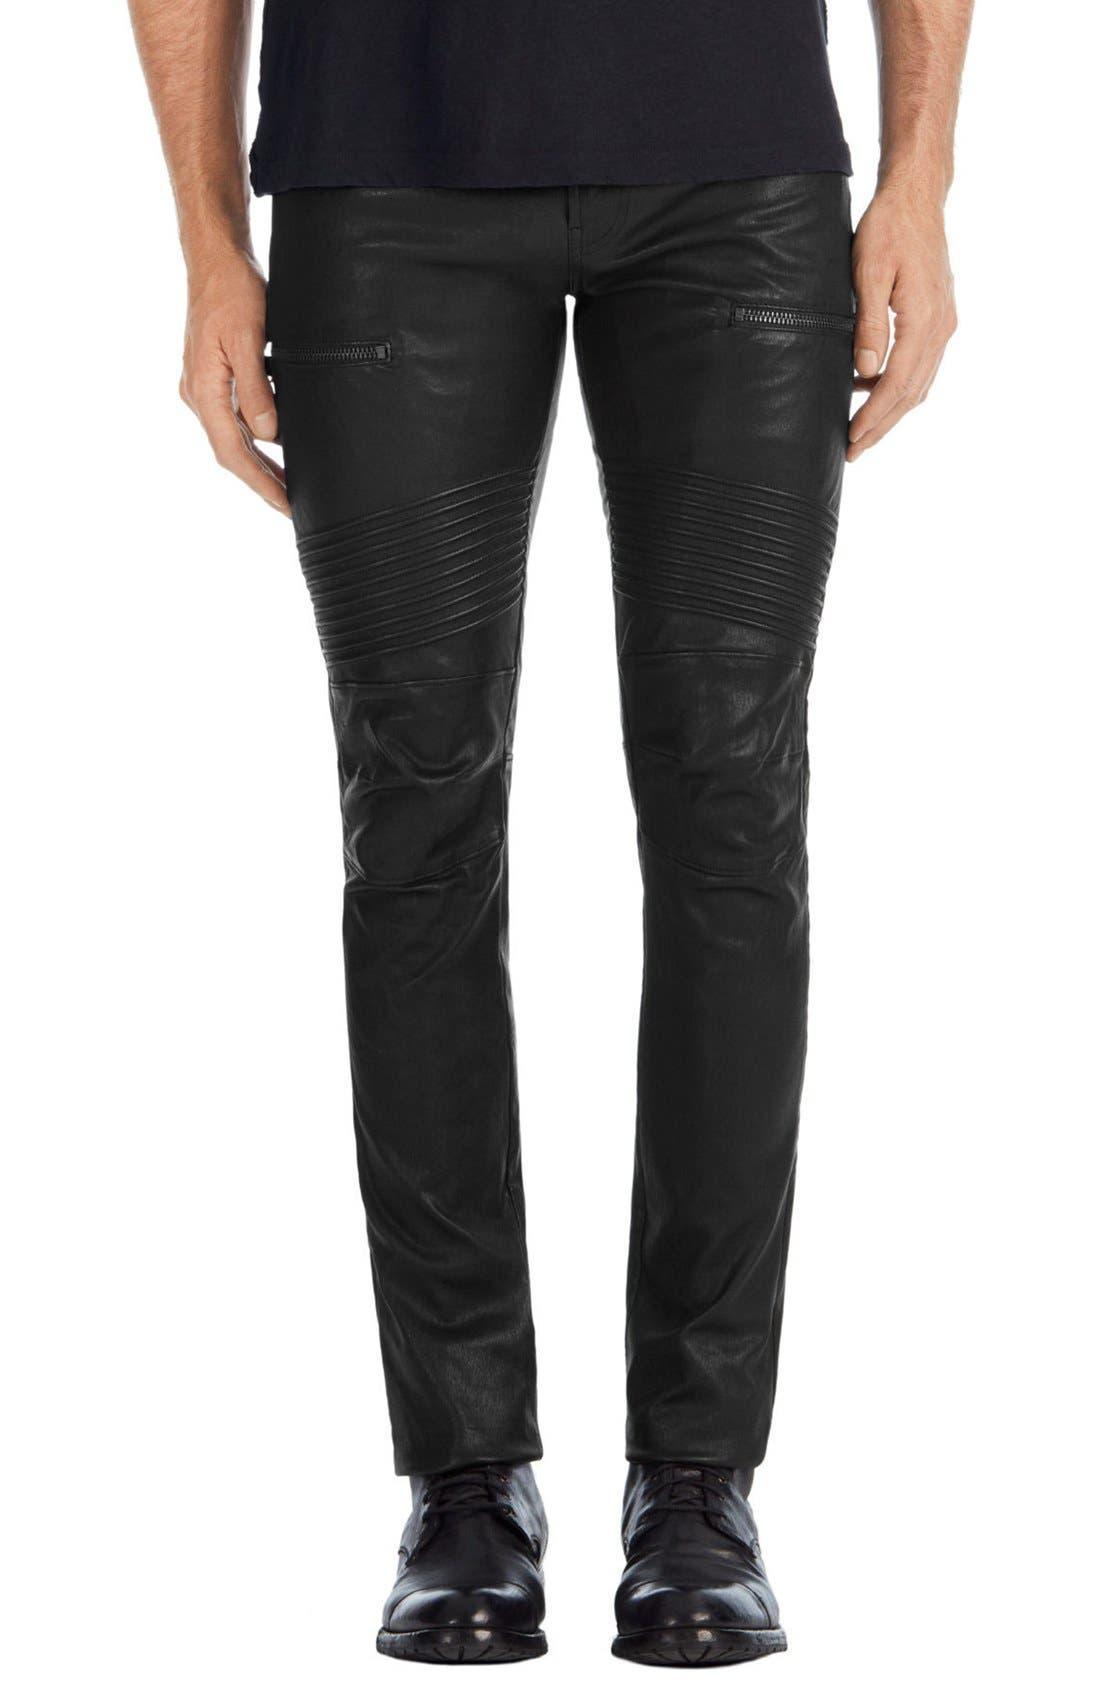 Acrux Skinny Fit Moto Leather Pants,                             Main thumbnail 1, color,